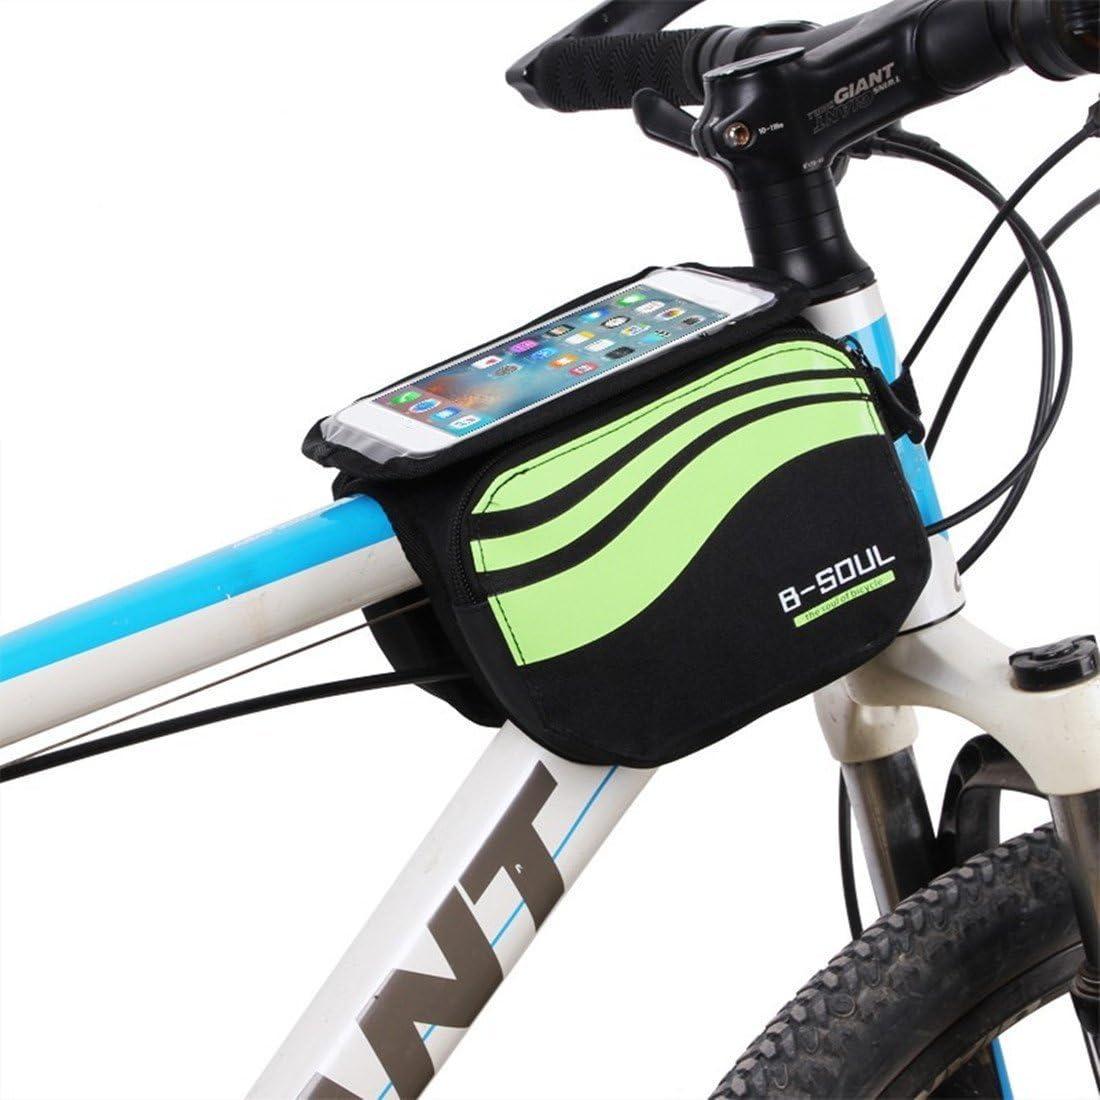 Panniers Rack Trunks Sports Outdoors Bike Front Handlebar Bag 5 8 Inch Pvc Mobile Transparent Waterproof Bag For Mtb Mountain Bikes